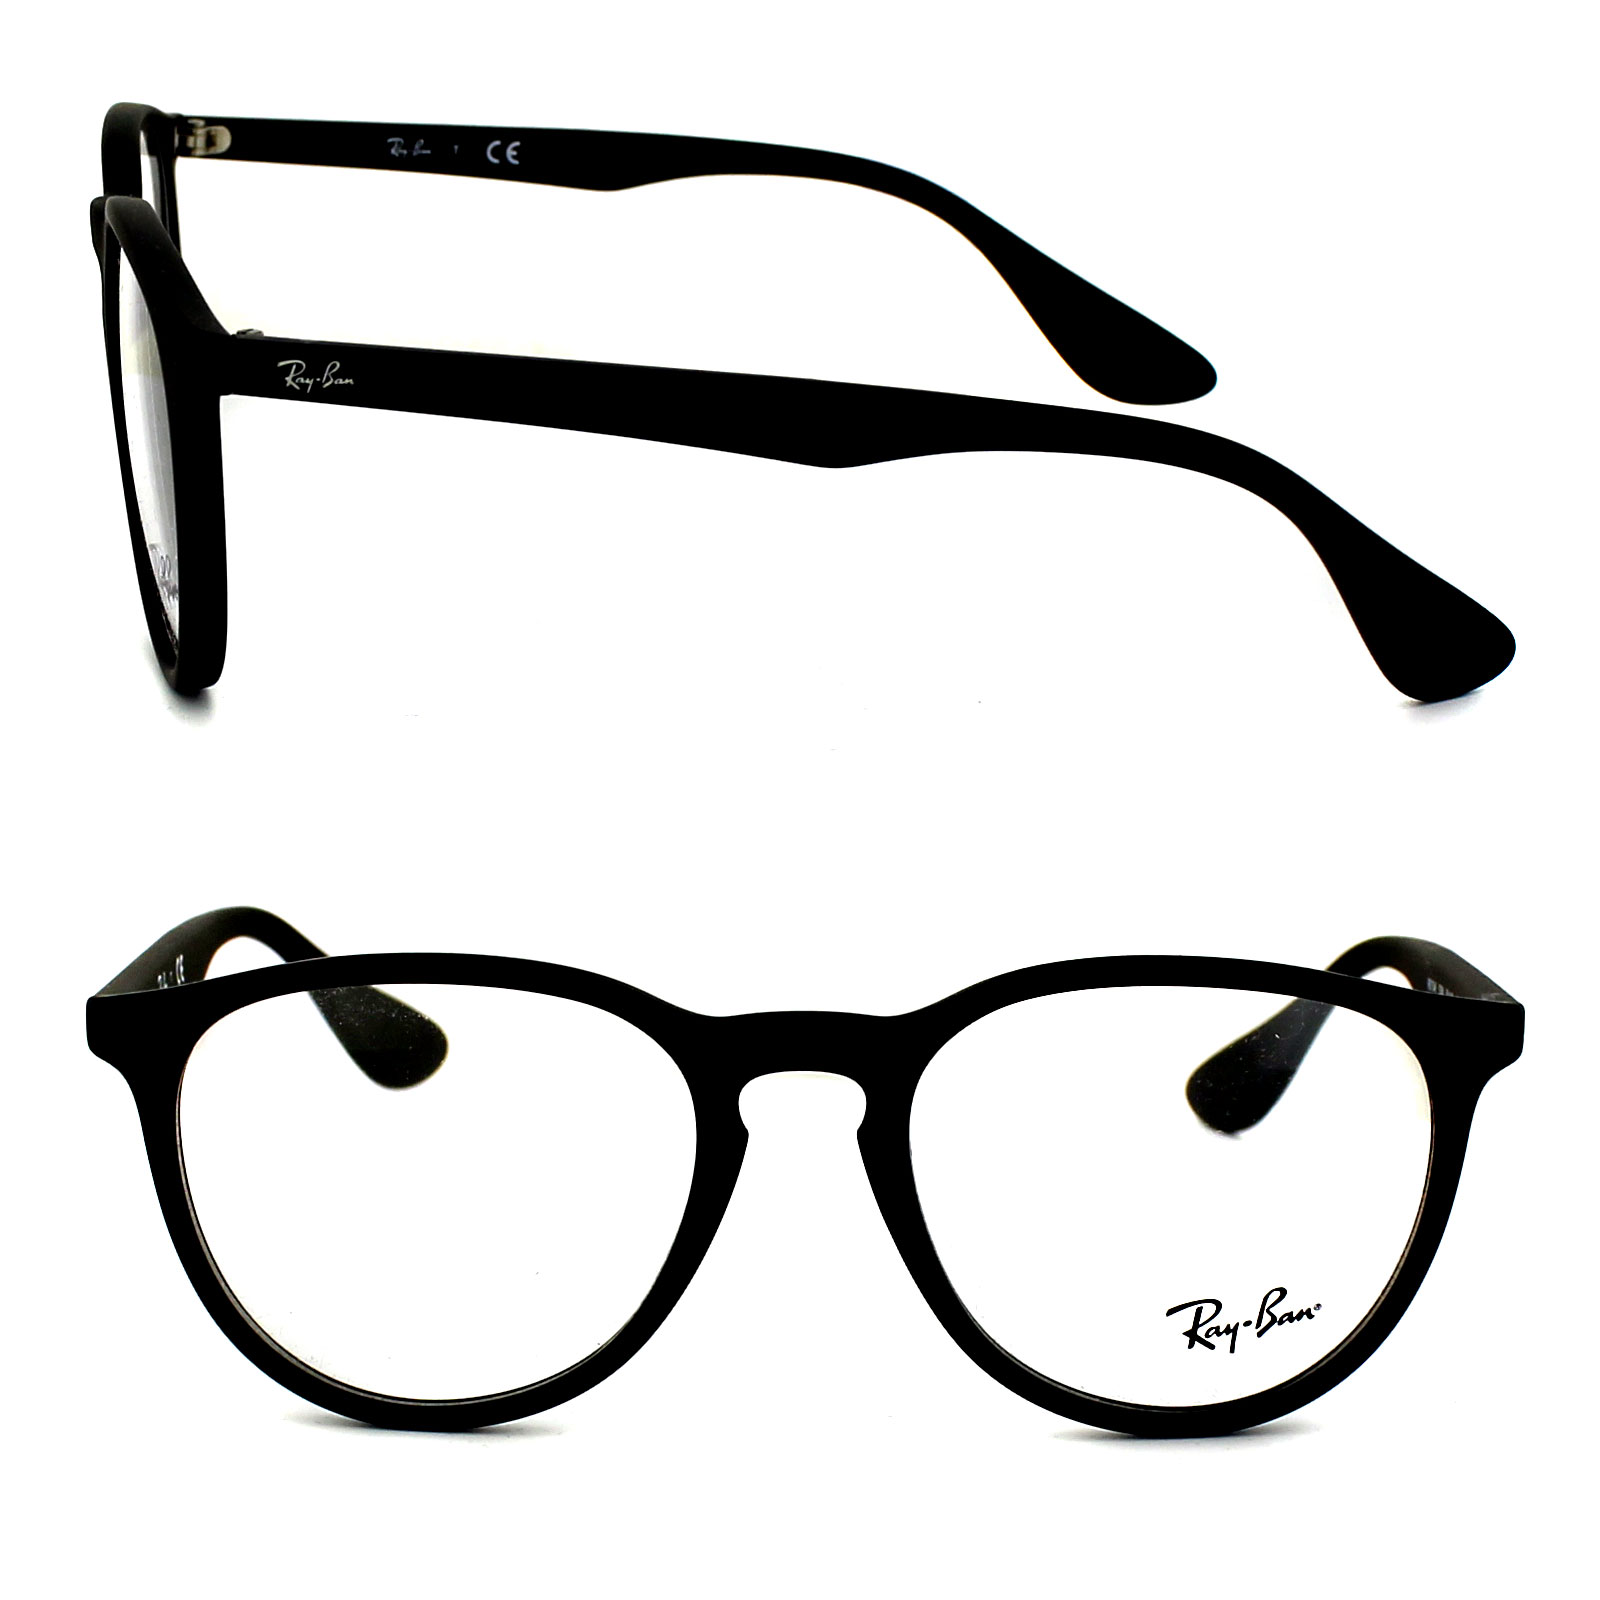 ray ban glasses frames ebay - Ebay Glasses Frames